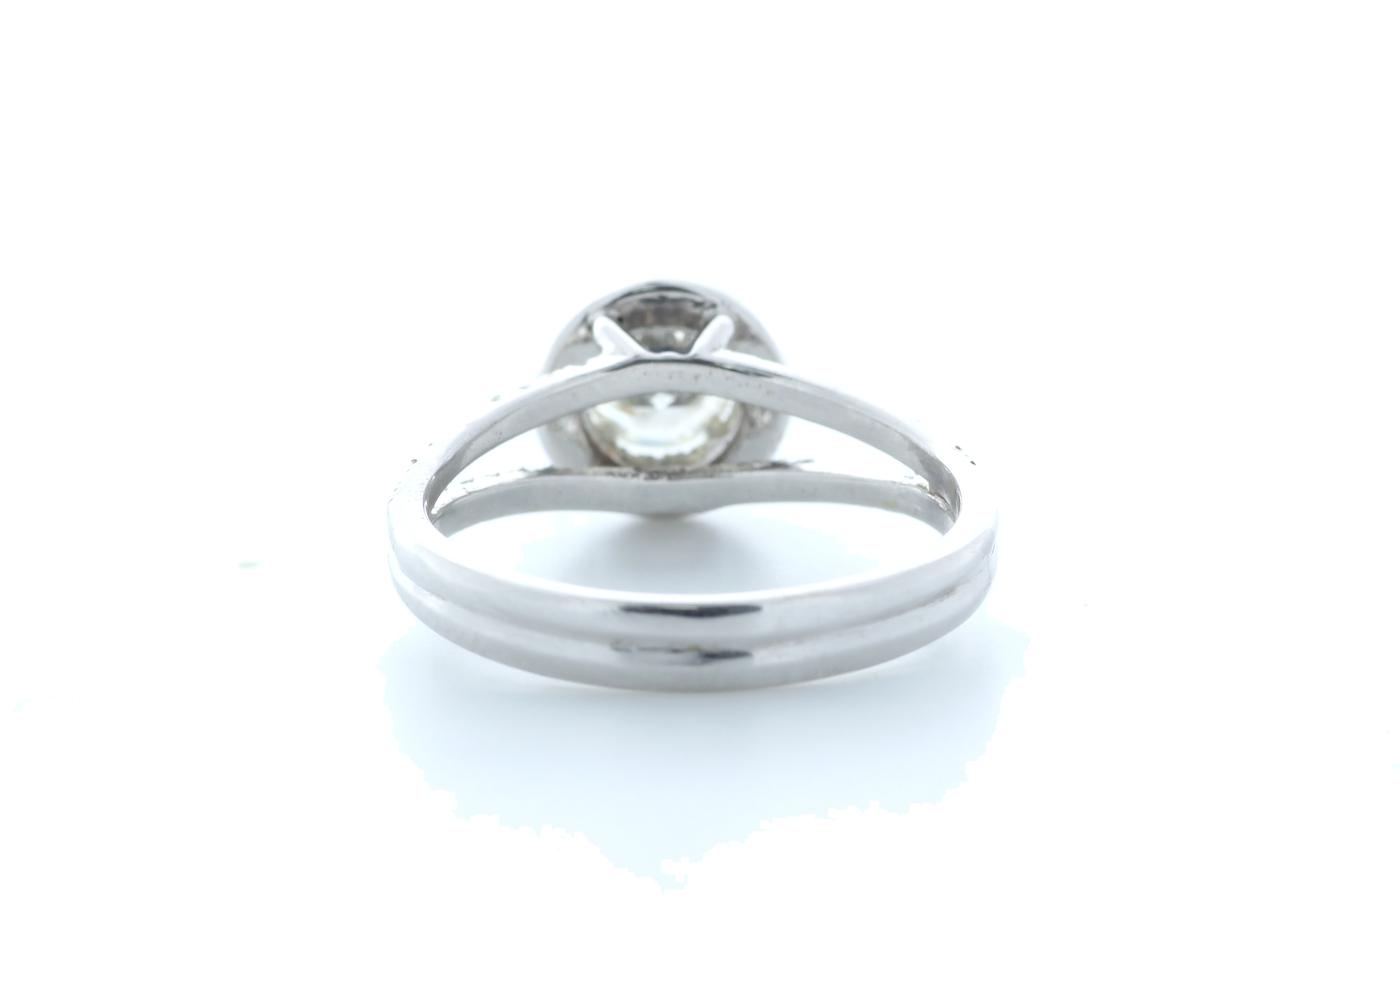 18k White Gold Single Stone With Halo Setting Ring 0.78 (0.45) Carats - Image 3 of 5